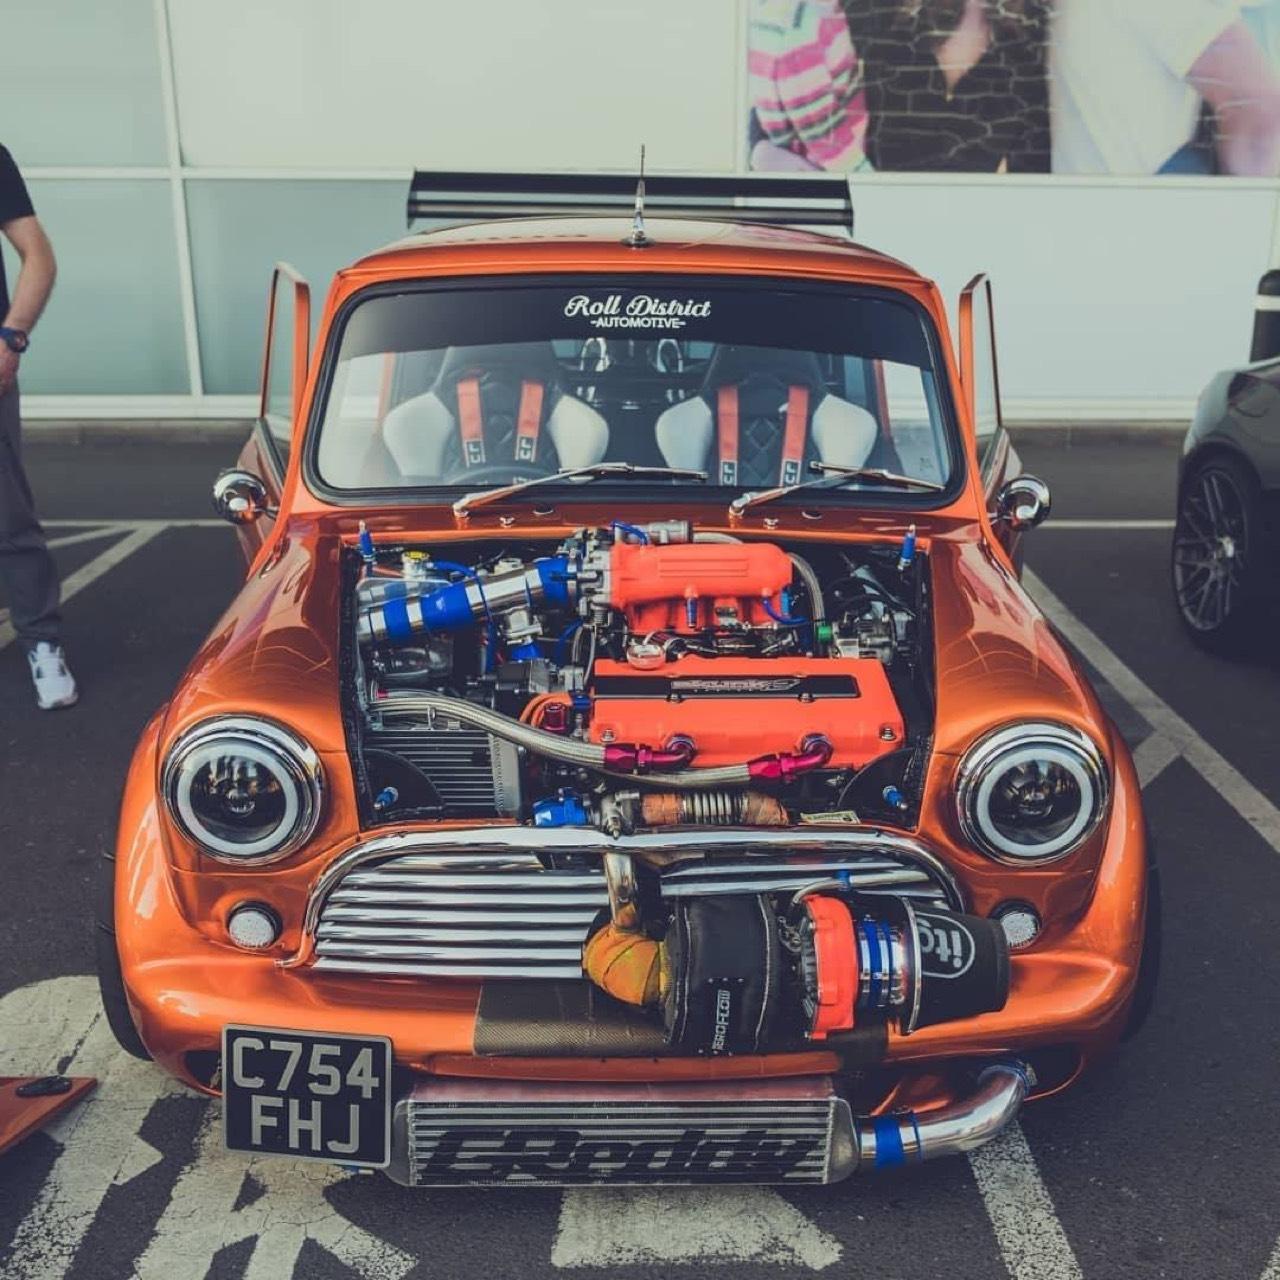 Austin Mini B16 Turbo... Shootée aux hormones ! 6